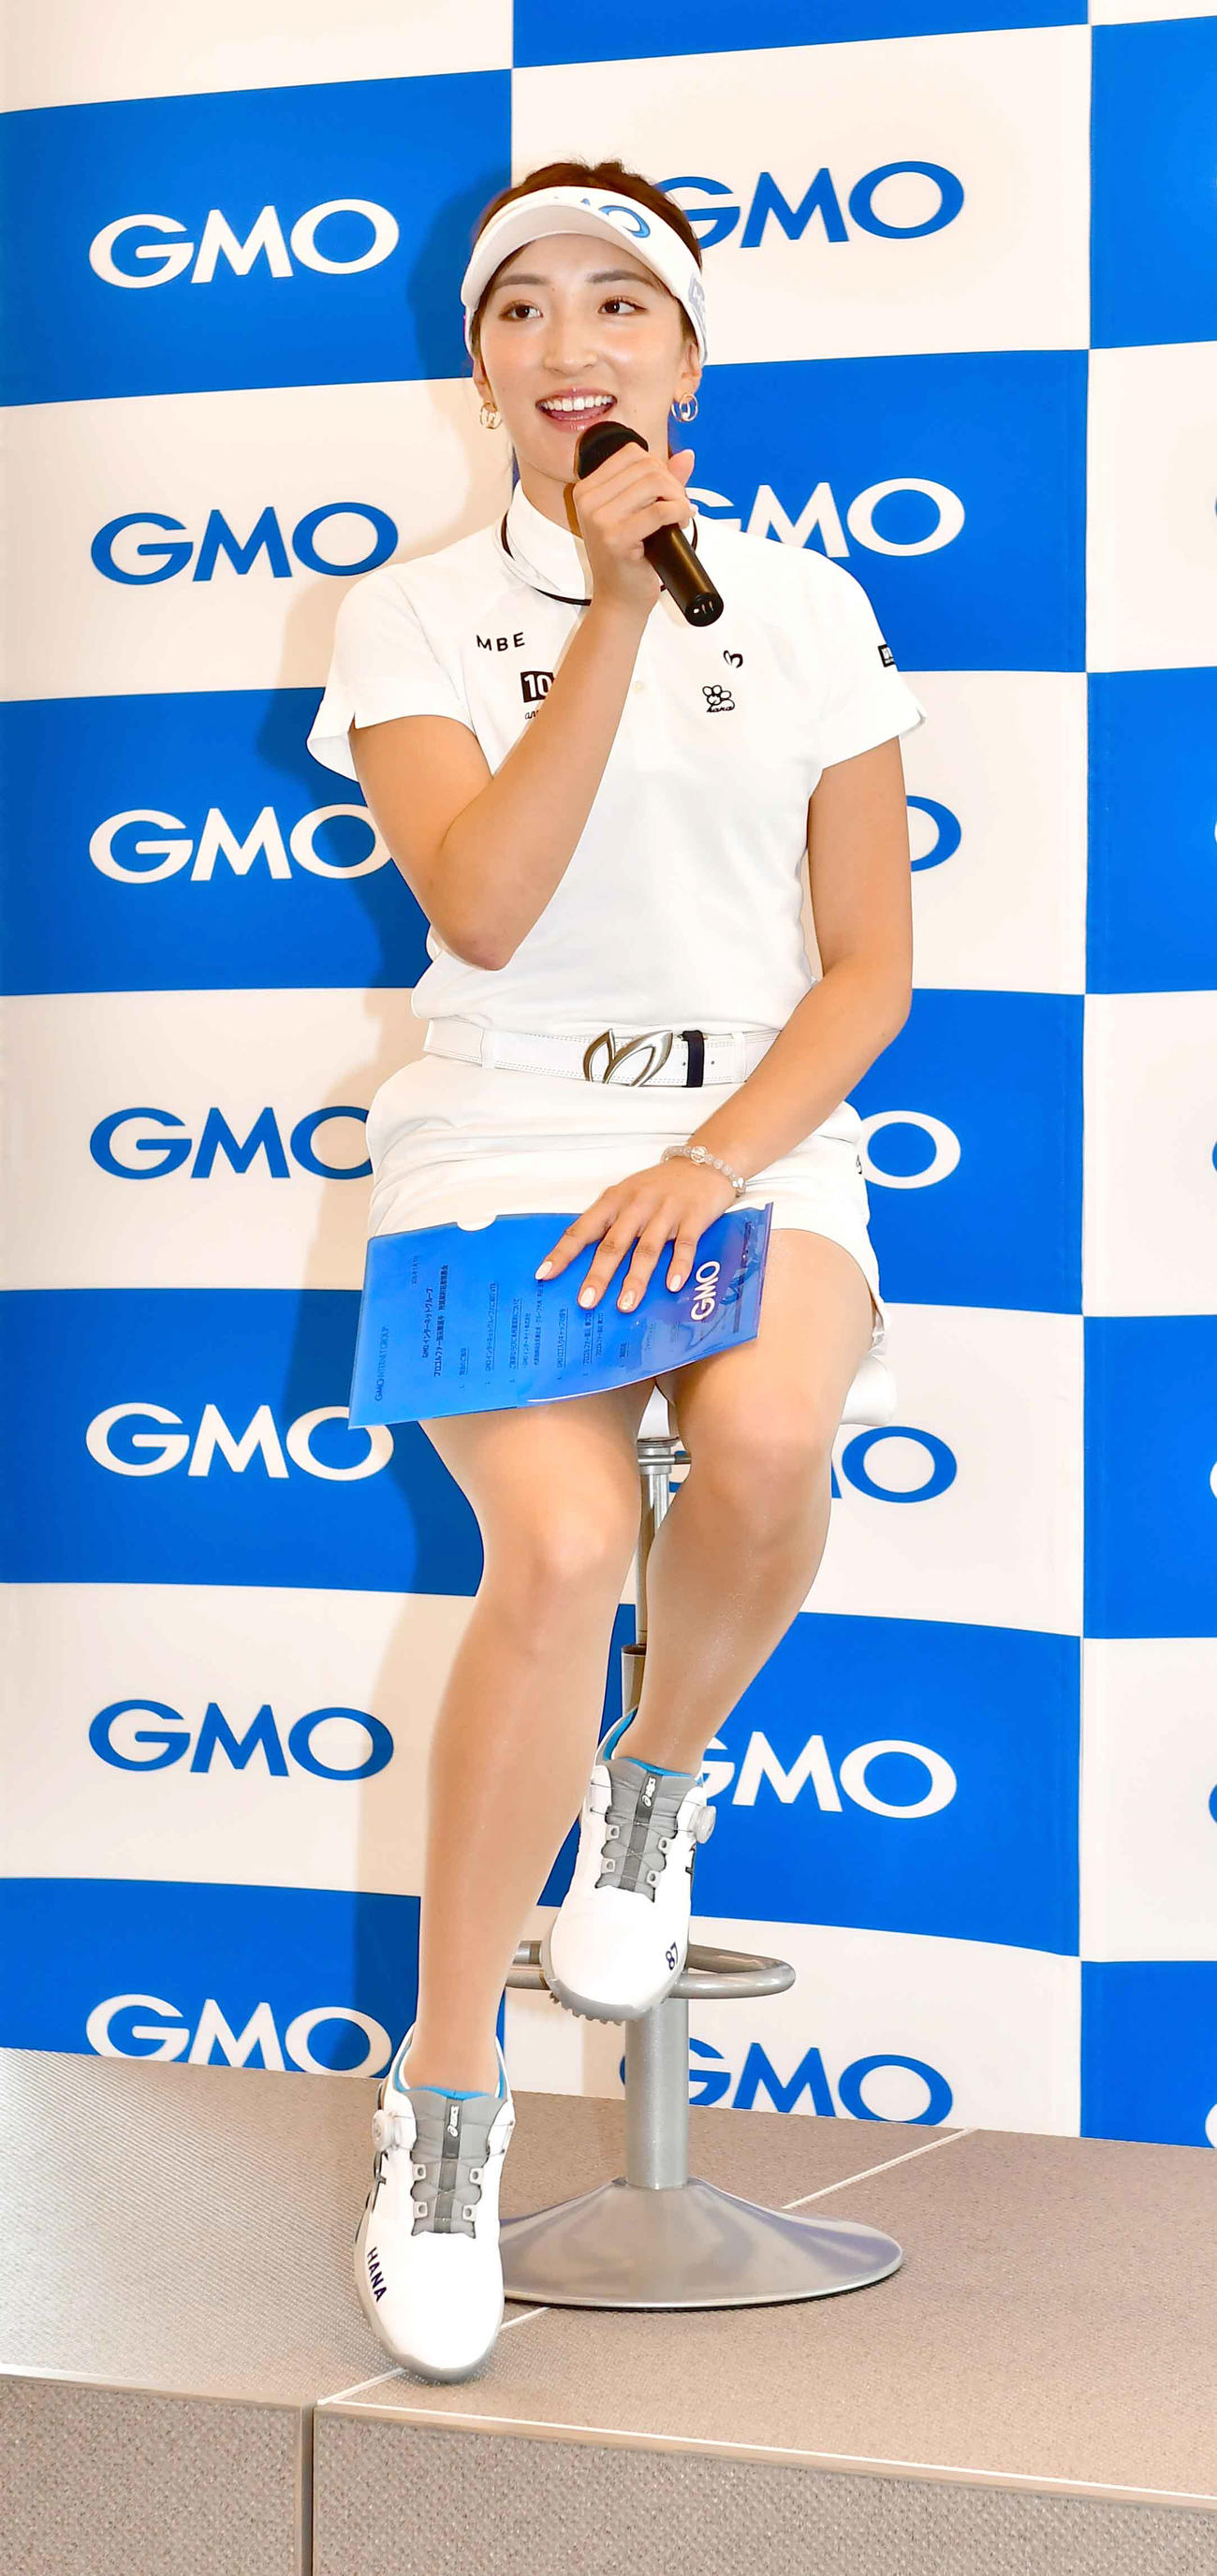 GMOインターネットグループと所属契約を締結し記者会見に臨む女子プロゴルファーの脇元(撮影・小沢裕)